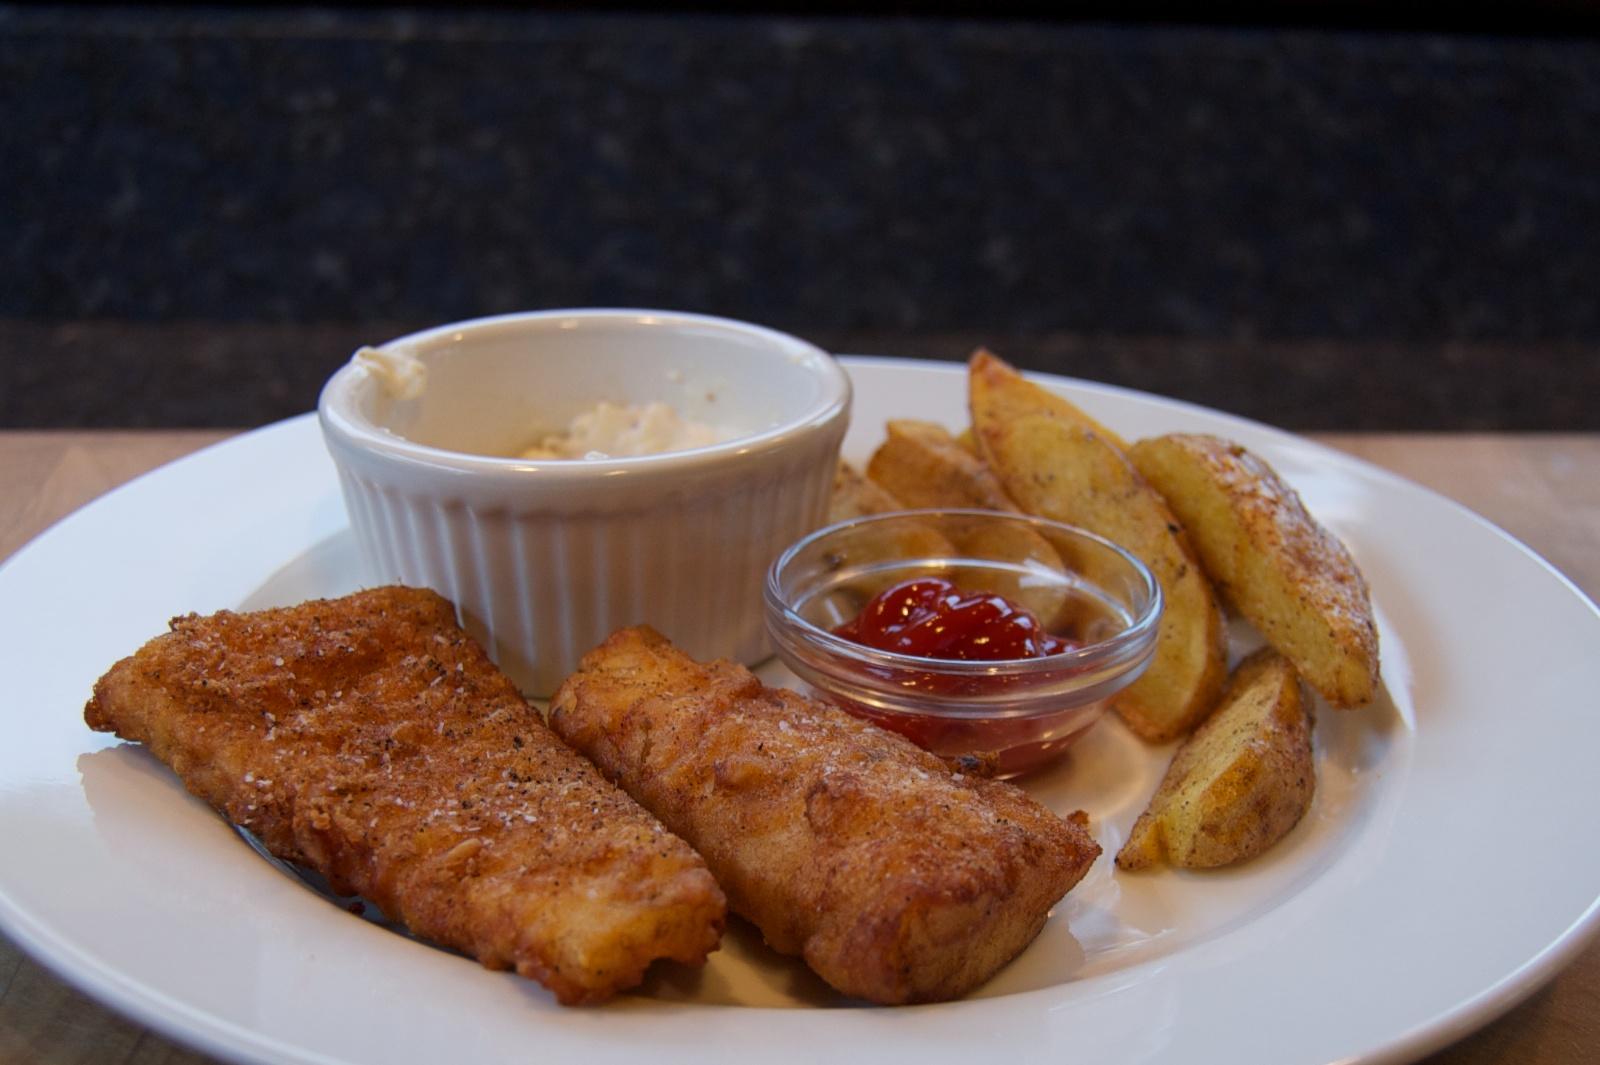 http://blog.rickk.com/food/2012/09/28/ate.2012.09.28.d.jpg